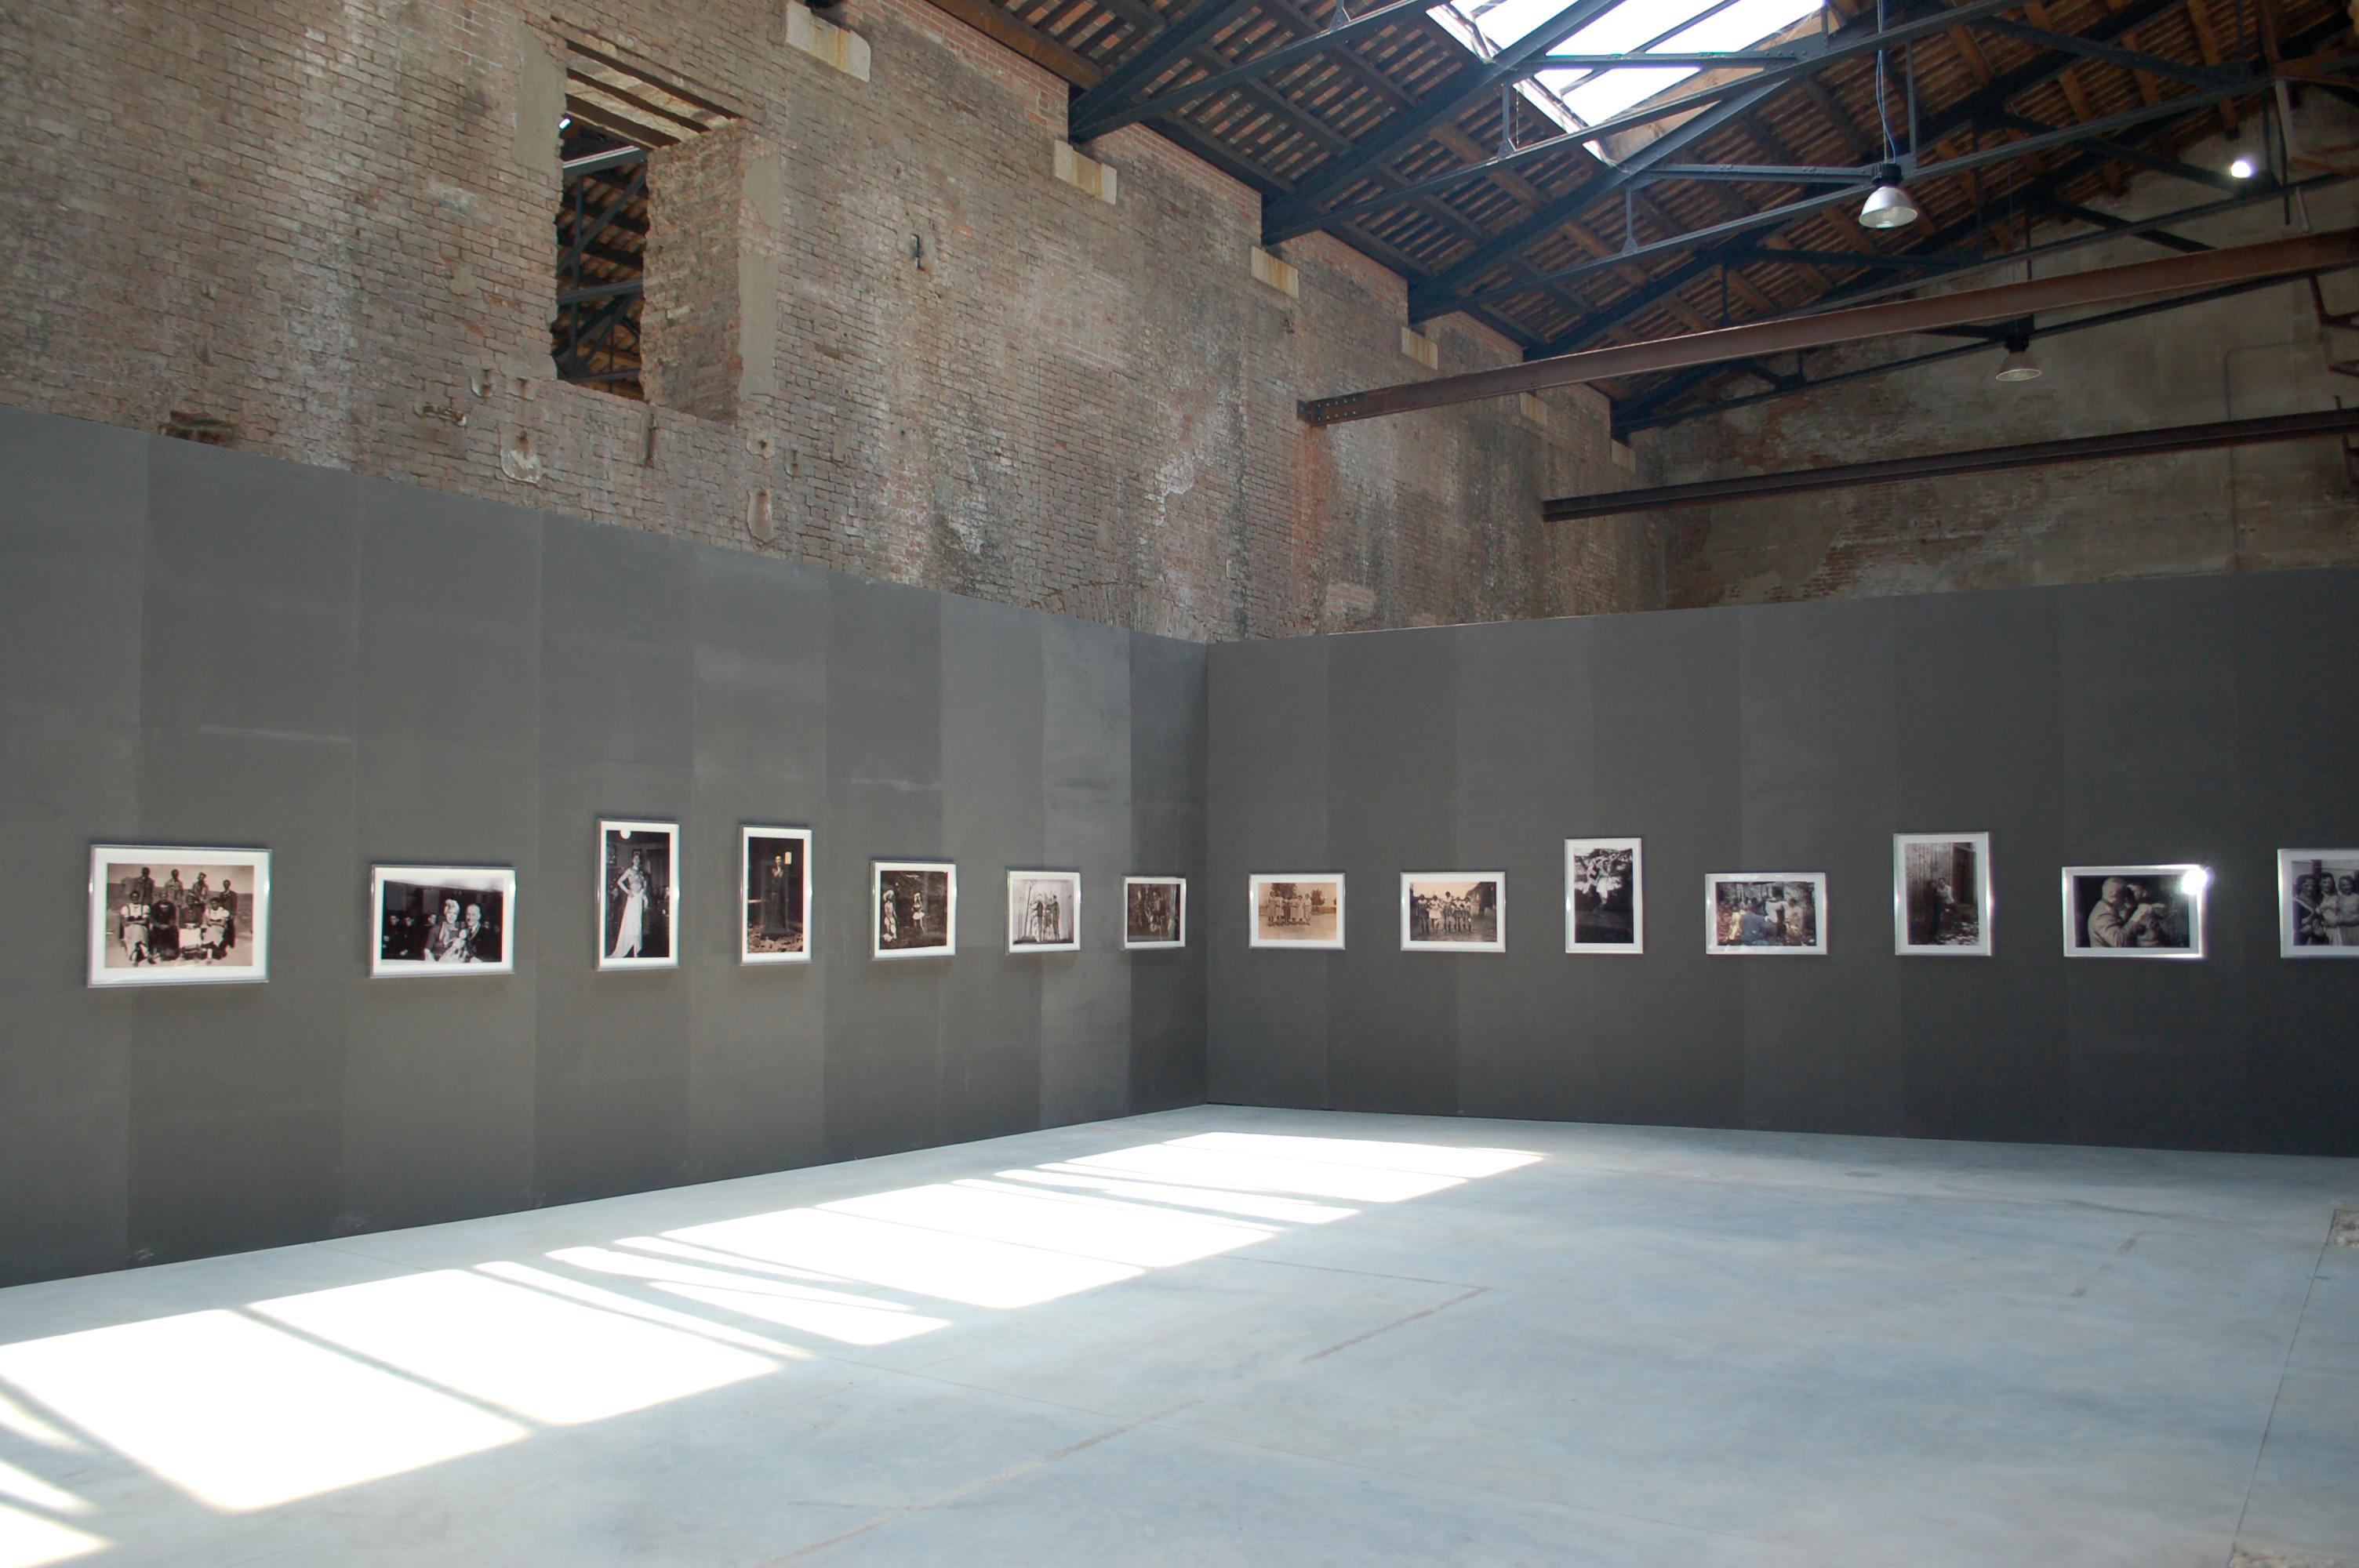 Galerie Barbara Thumm \ Martin Dammann – The Fear Society – Pavilion of Urgency